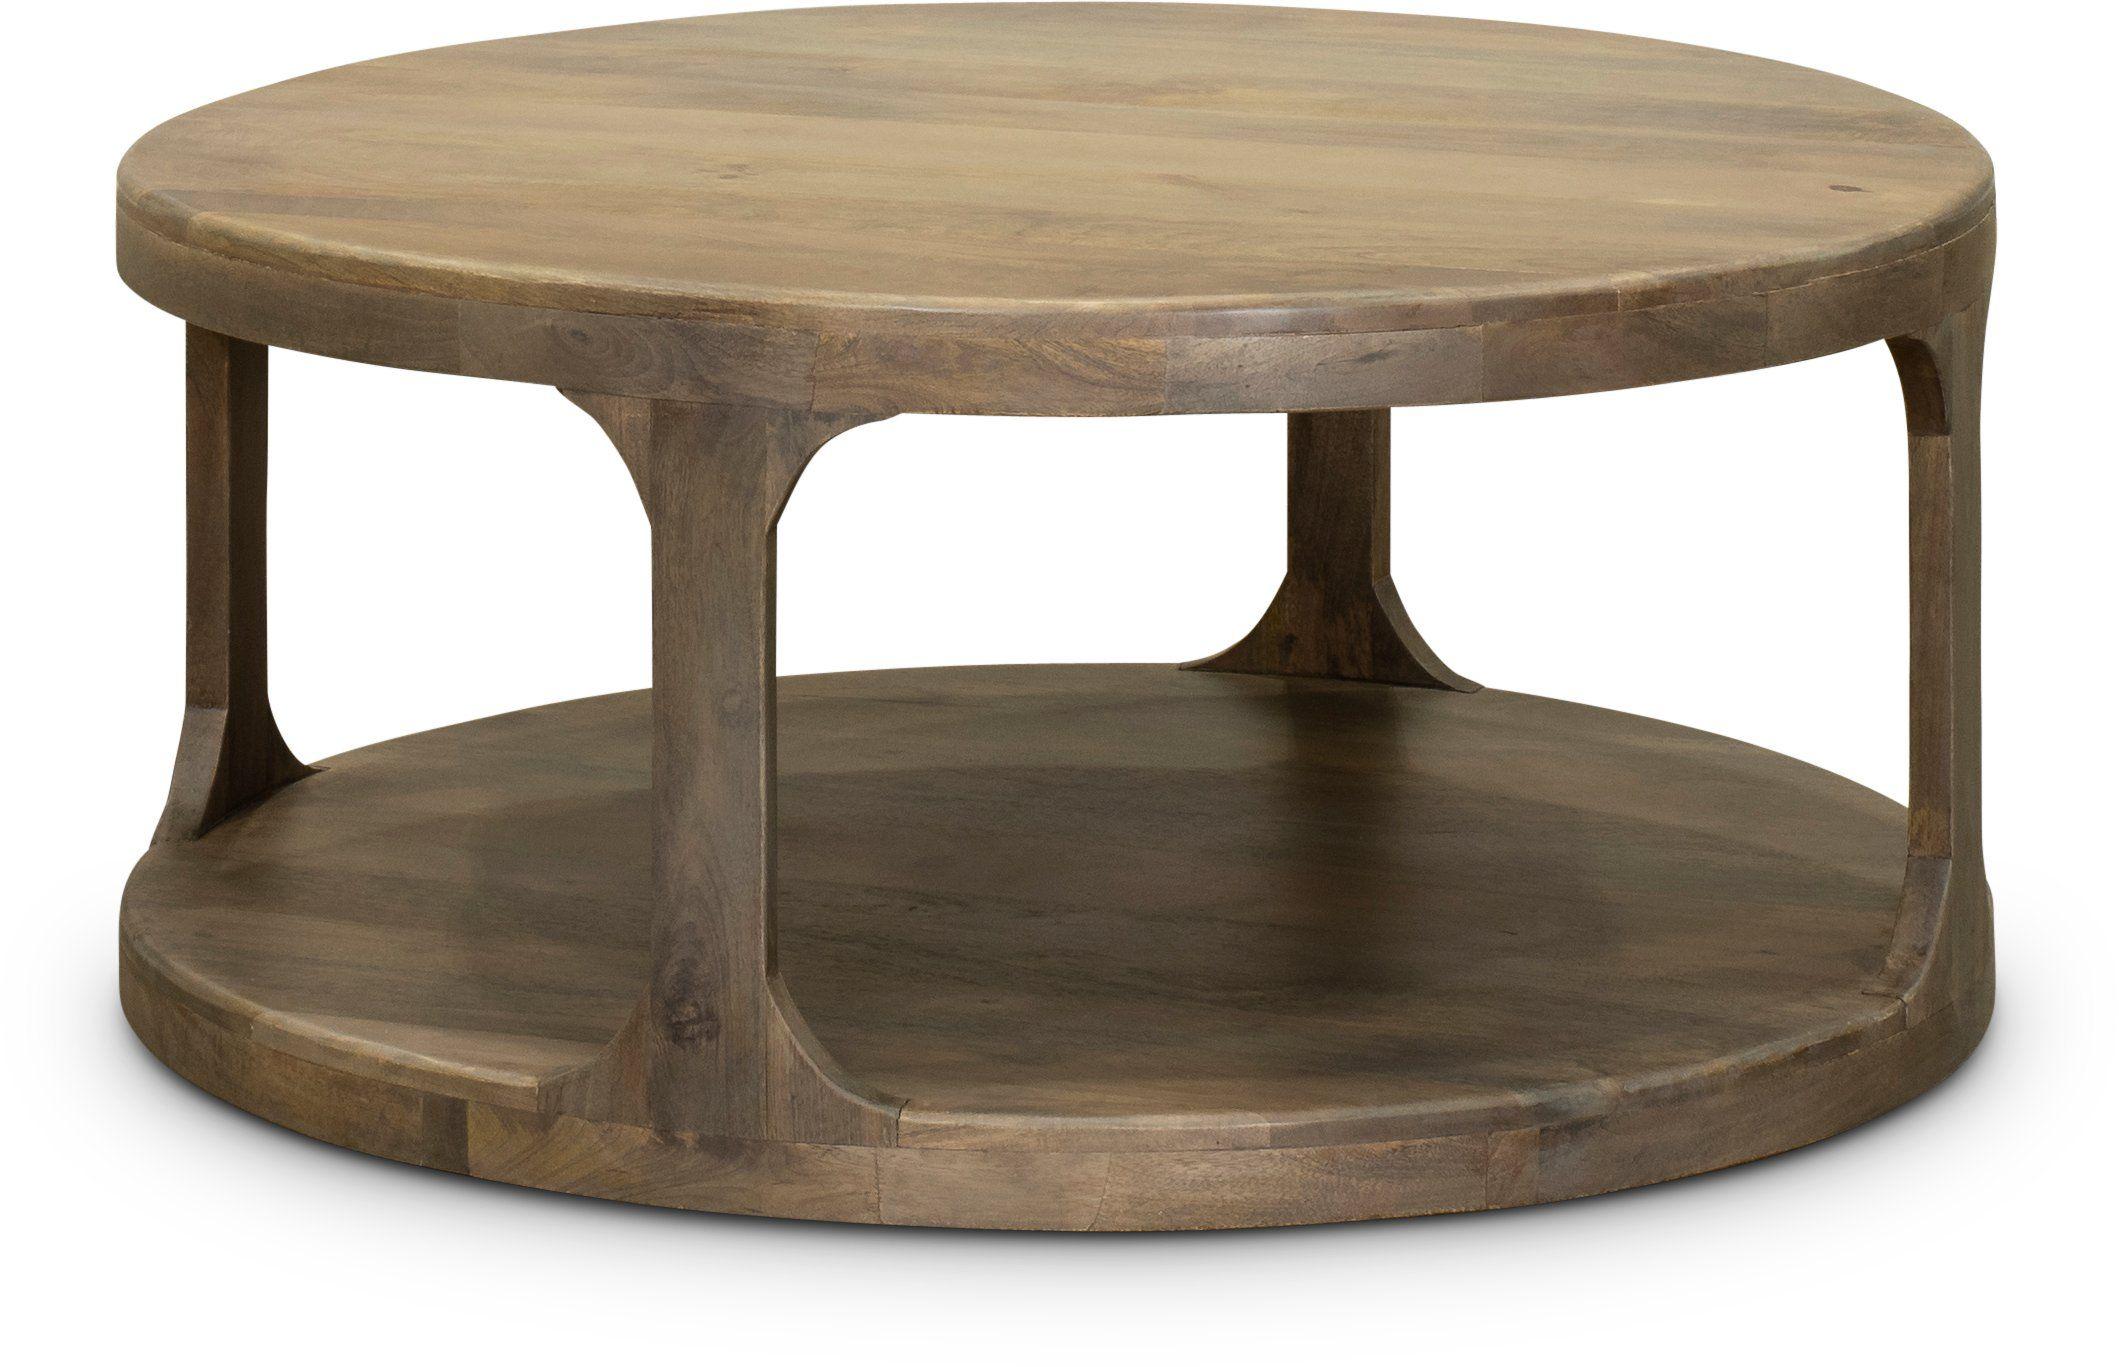 Mist Ash Round Coffee Table Mason Rc Willey Furniture Store Round Coffee Table Coffee Table Rc Willey Furniture [ jpg ]